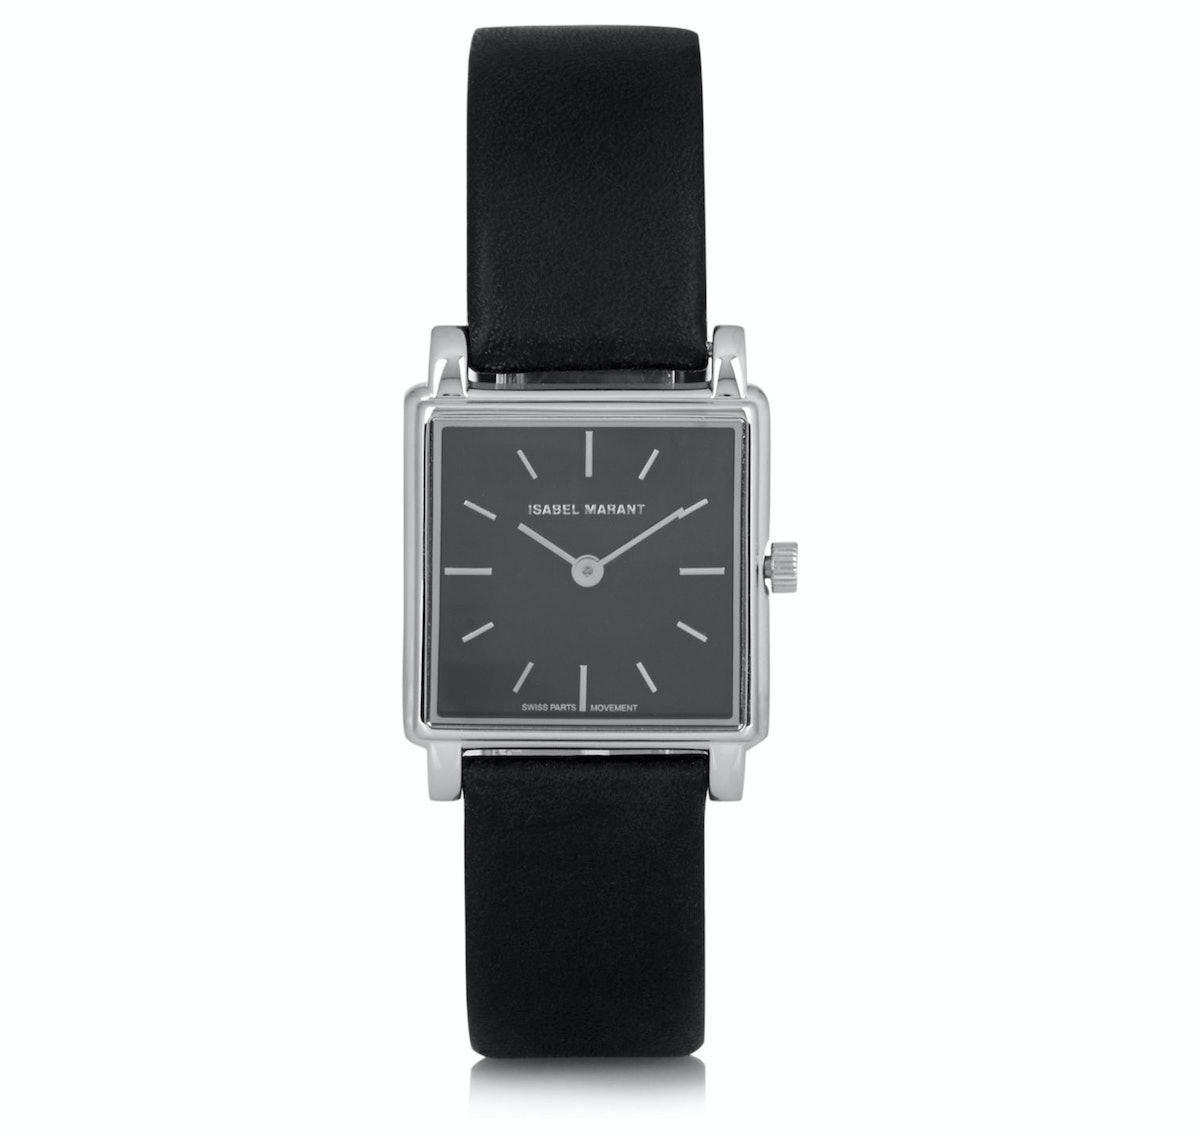 Isabel Marant watch